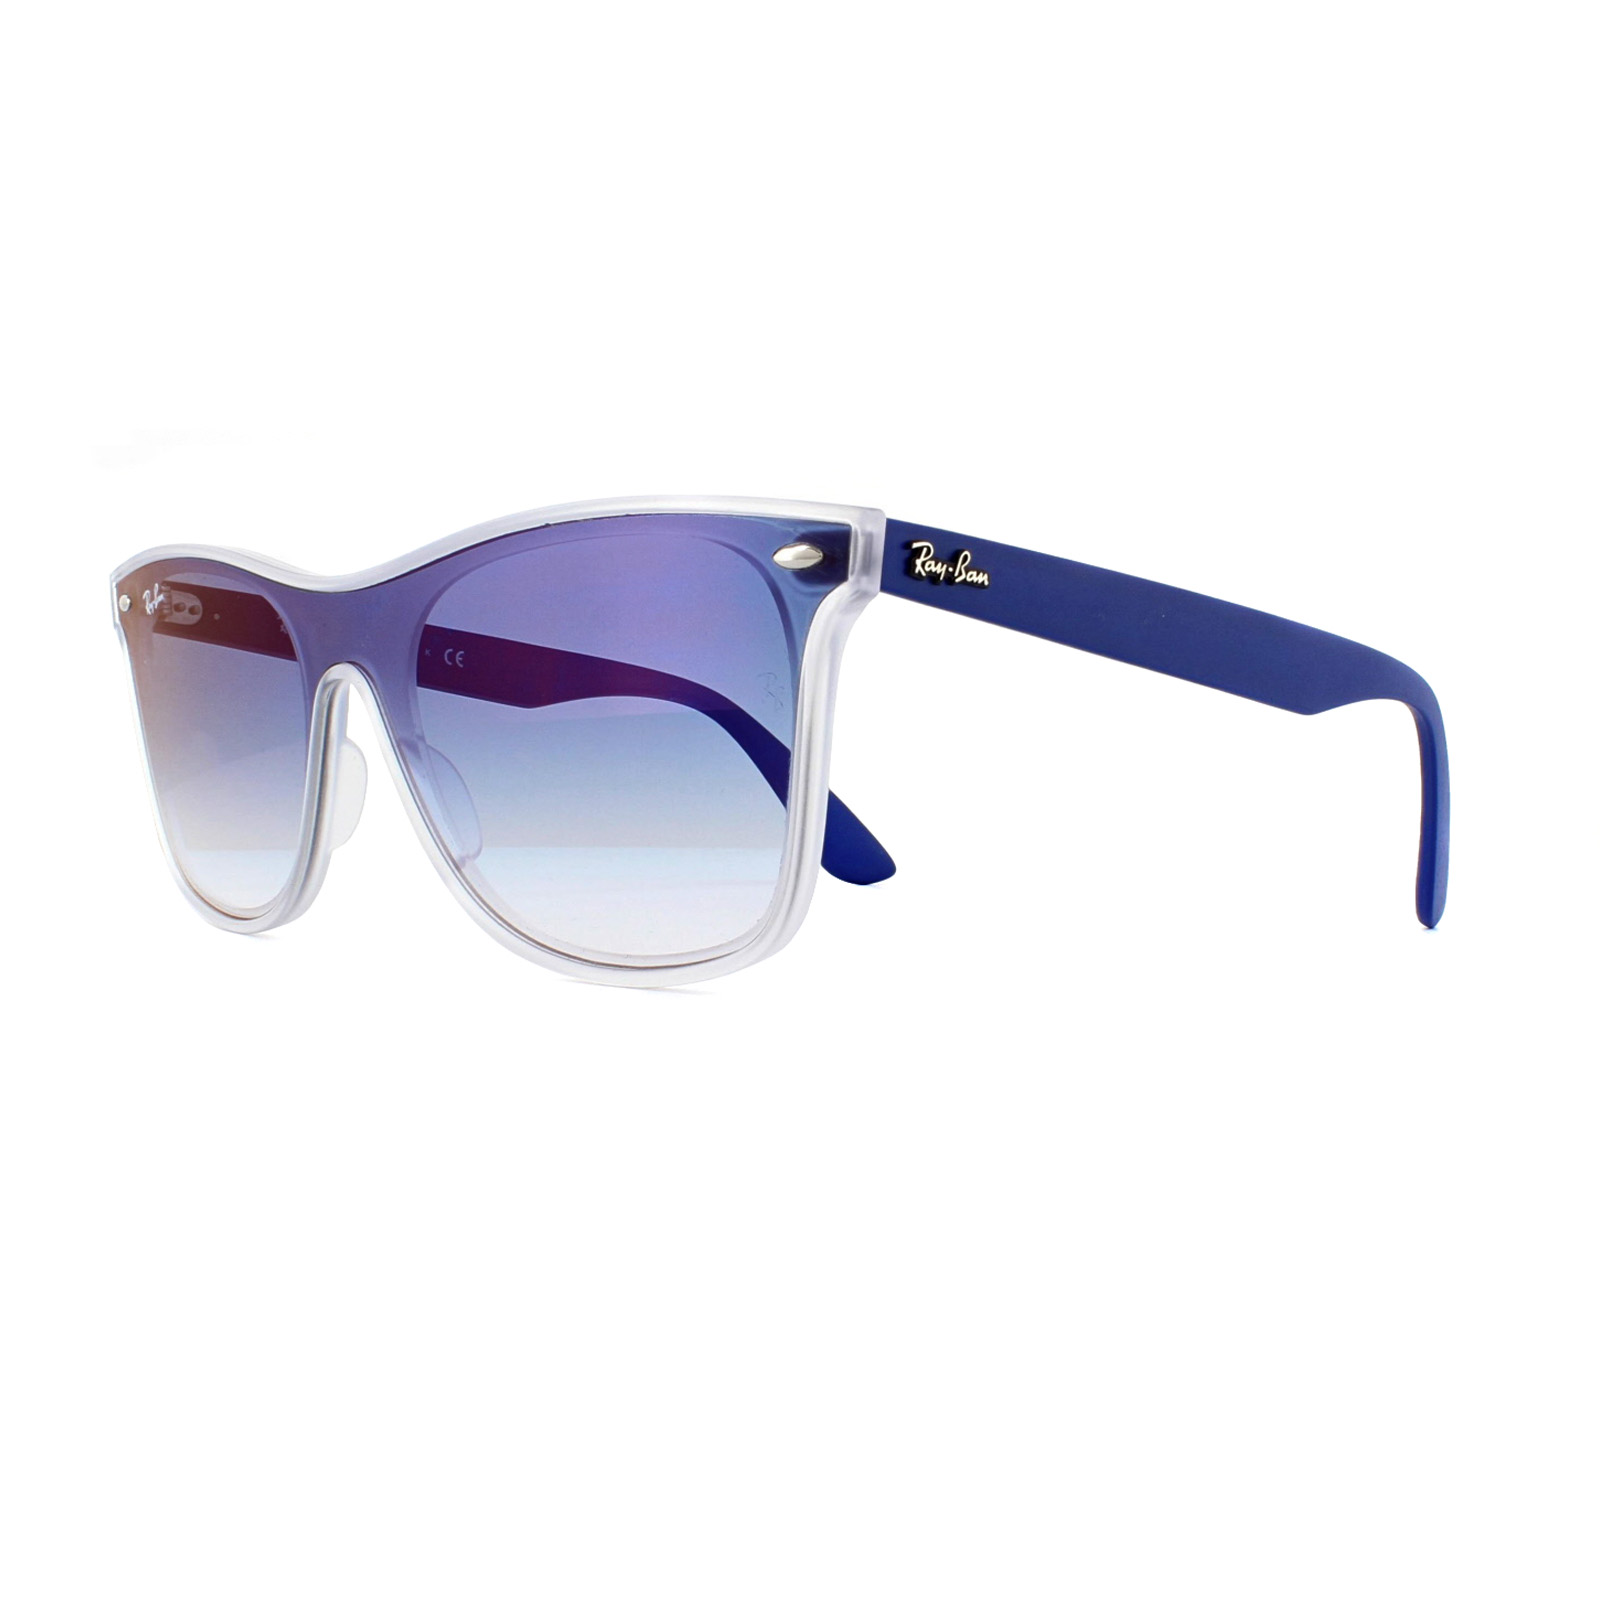 852a347d969a7 Details about Ray-Ban Sunglasses Blaze Wayfarer 4440N 6356X0 Transparent  Blue